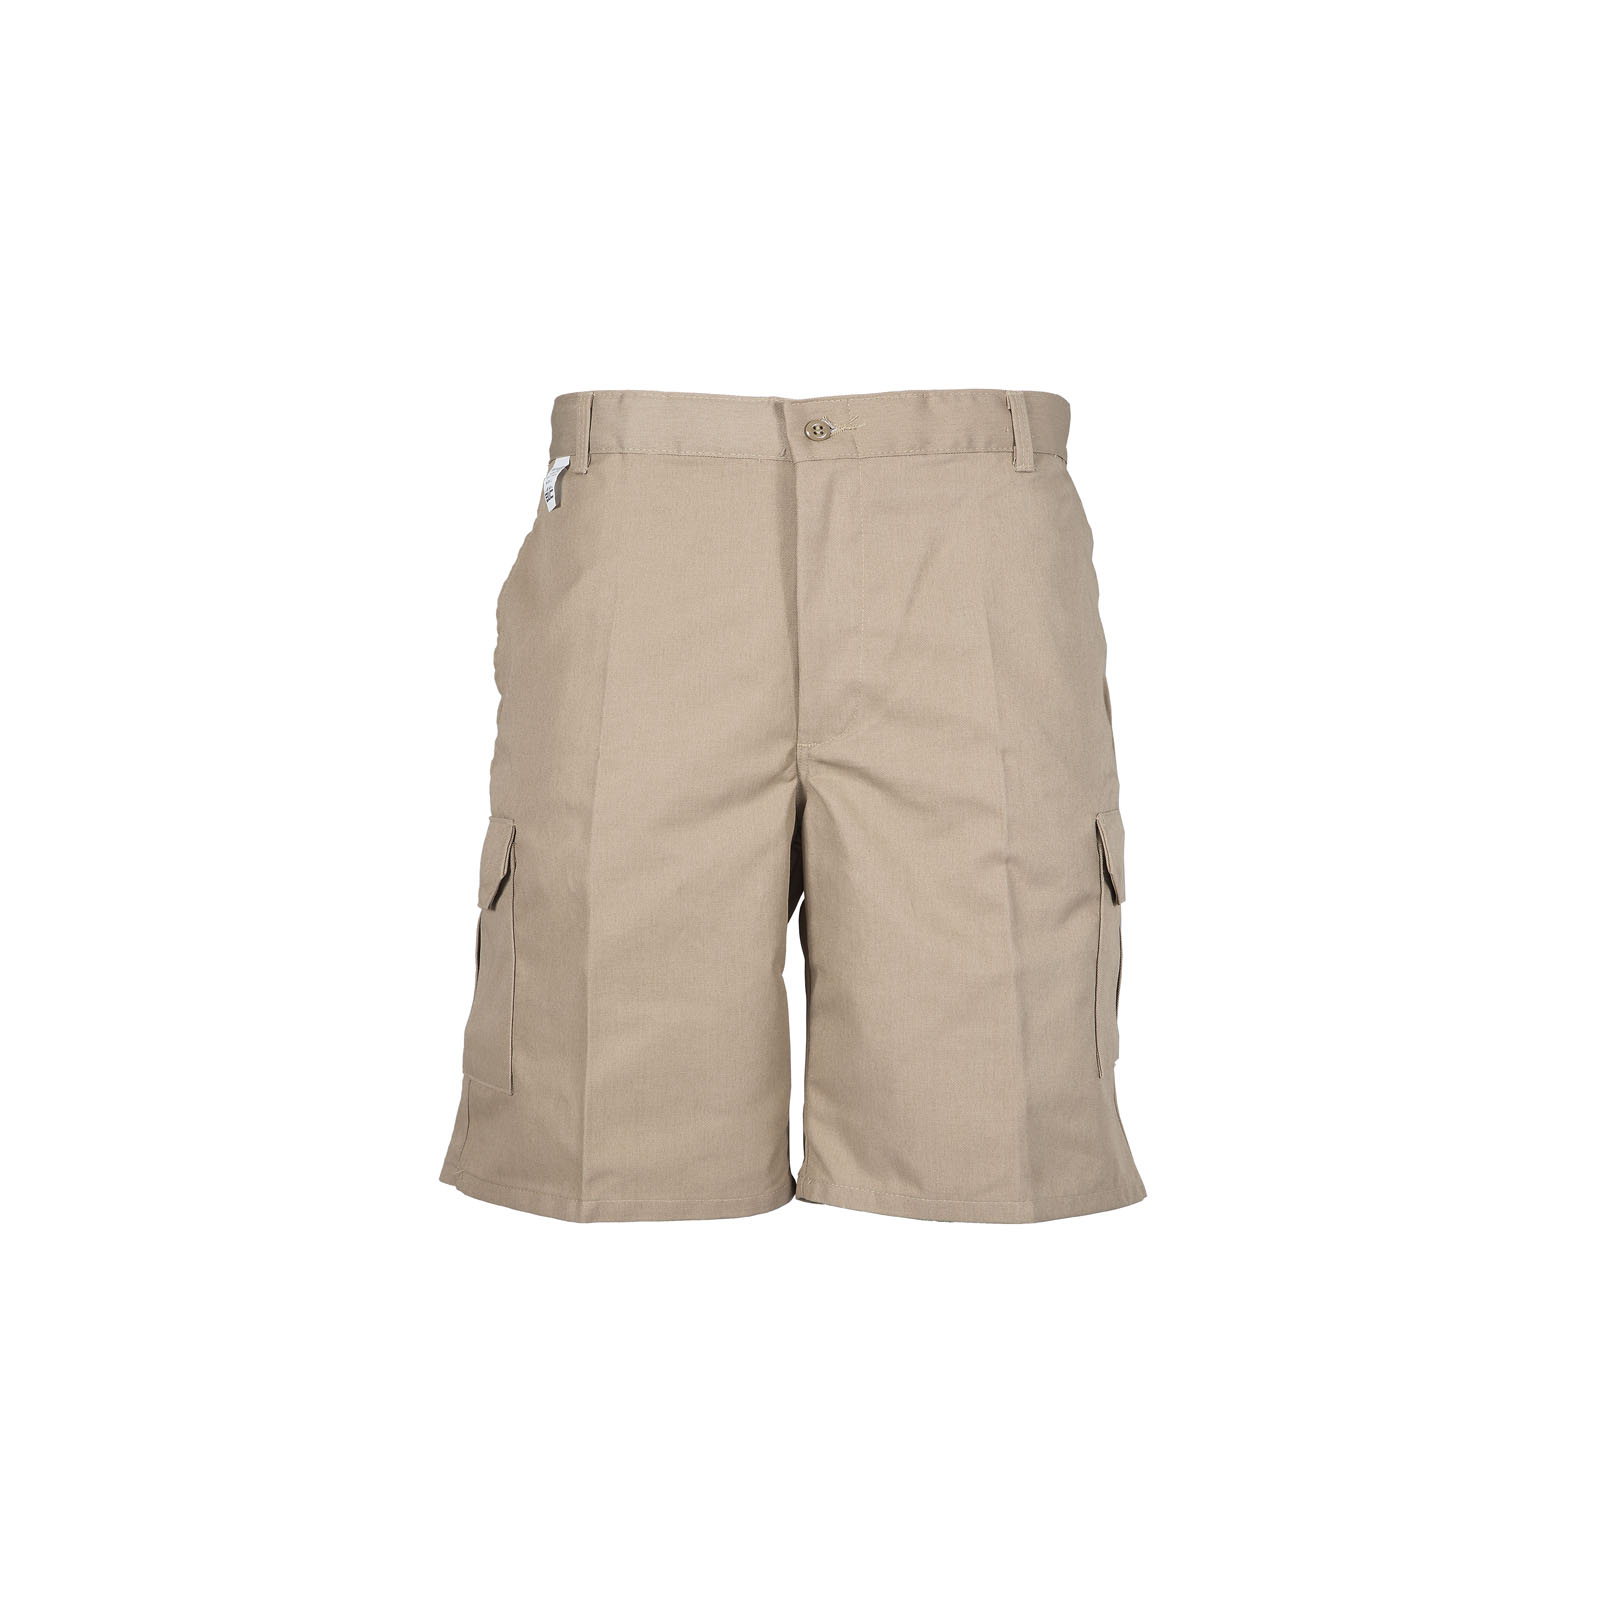 65/35 Male Shorts